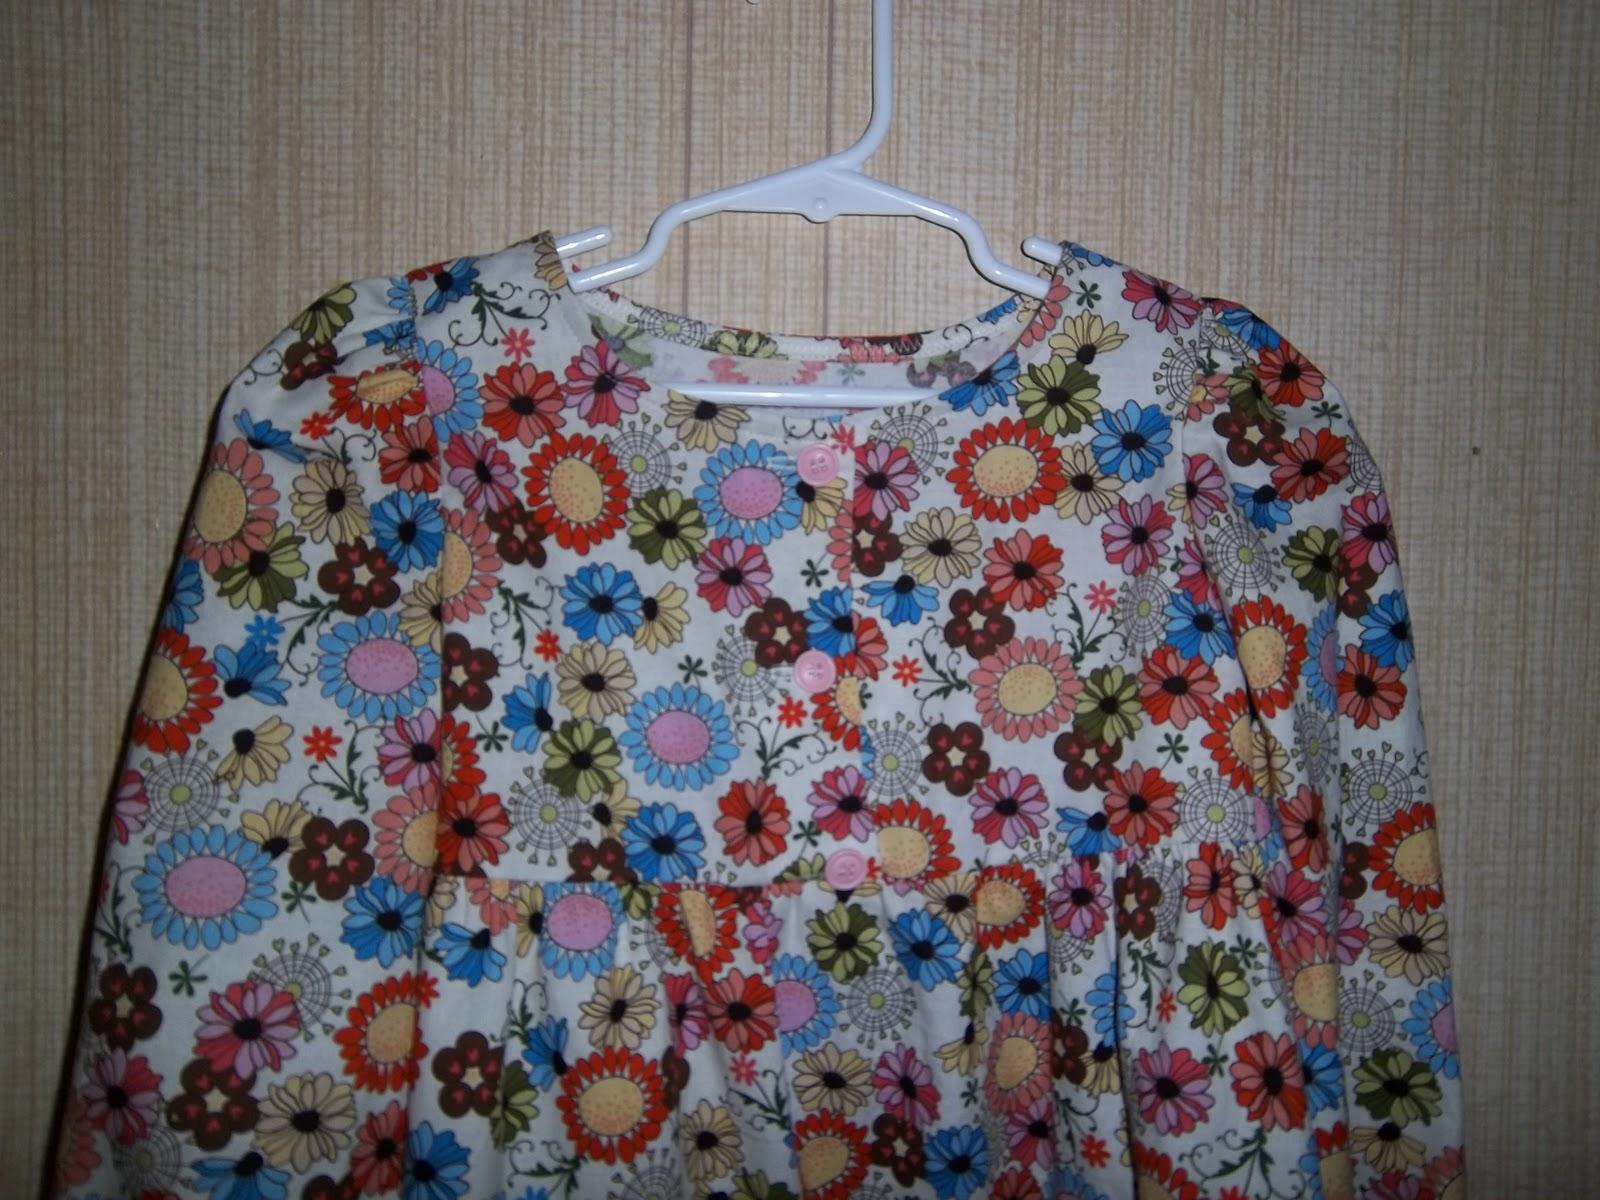 Sew A Fine Seam: Sew A Fine Seam: Dresses: Mixed Fabrics For Fall Fashion